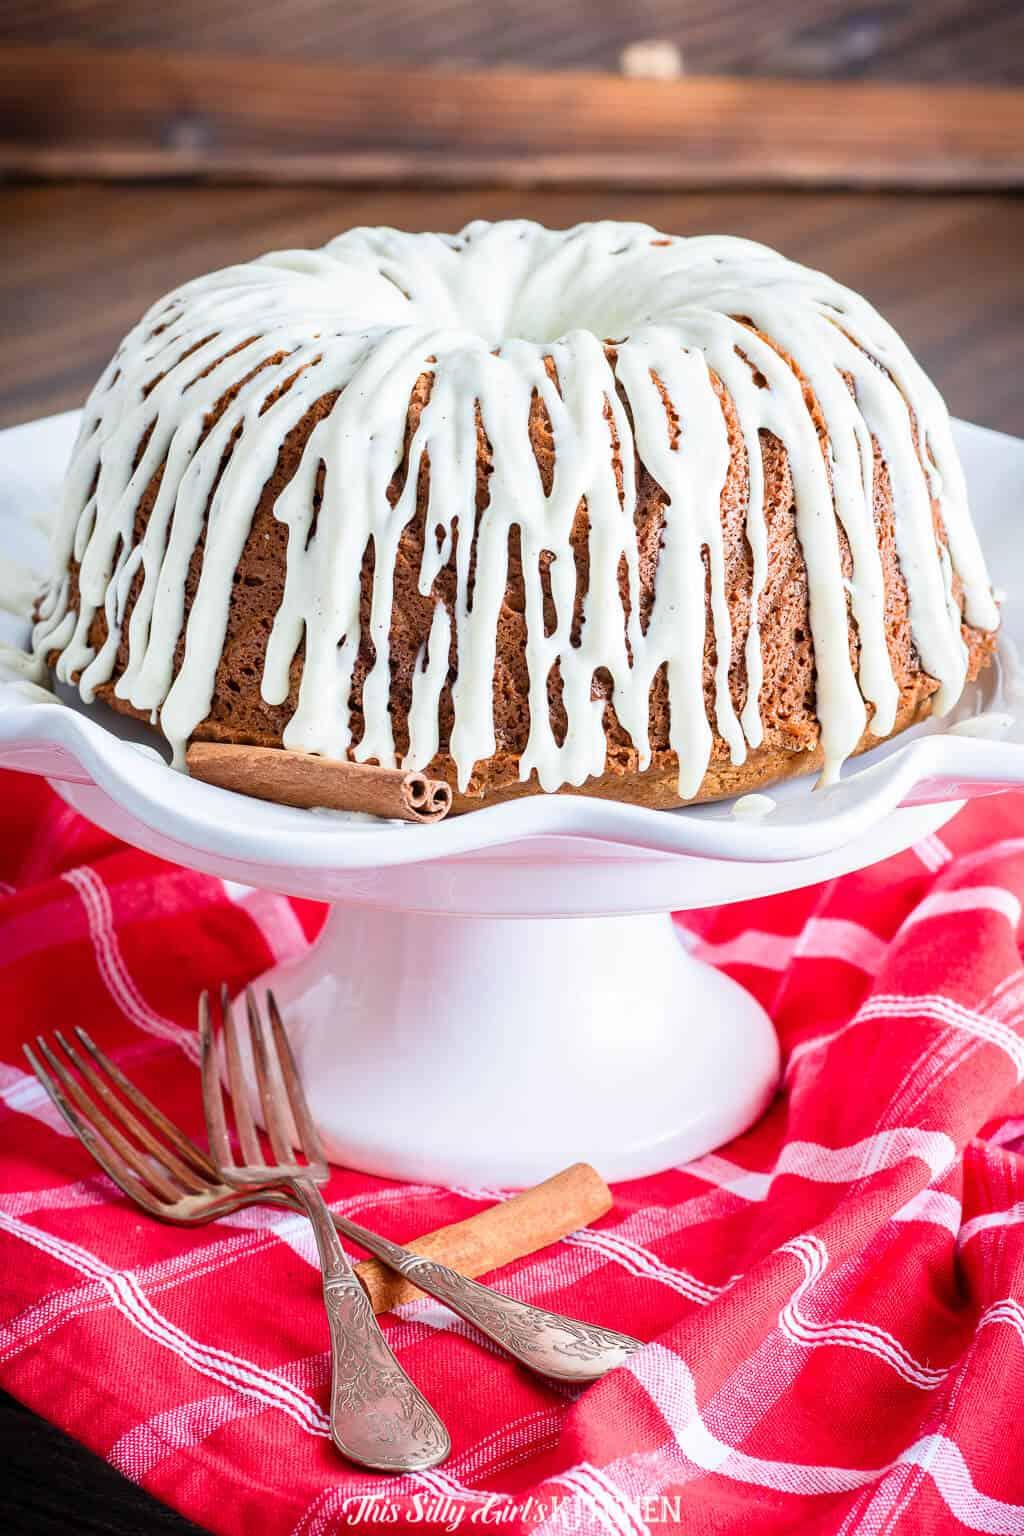 Coffee Cake on cake stand garnished with cinnamon sticks